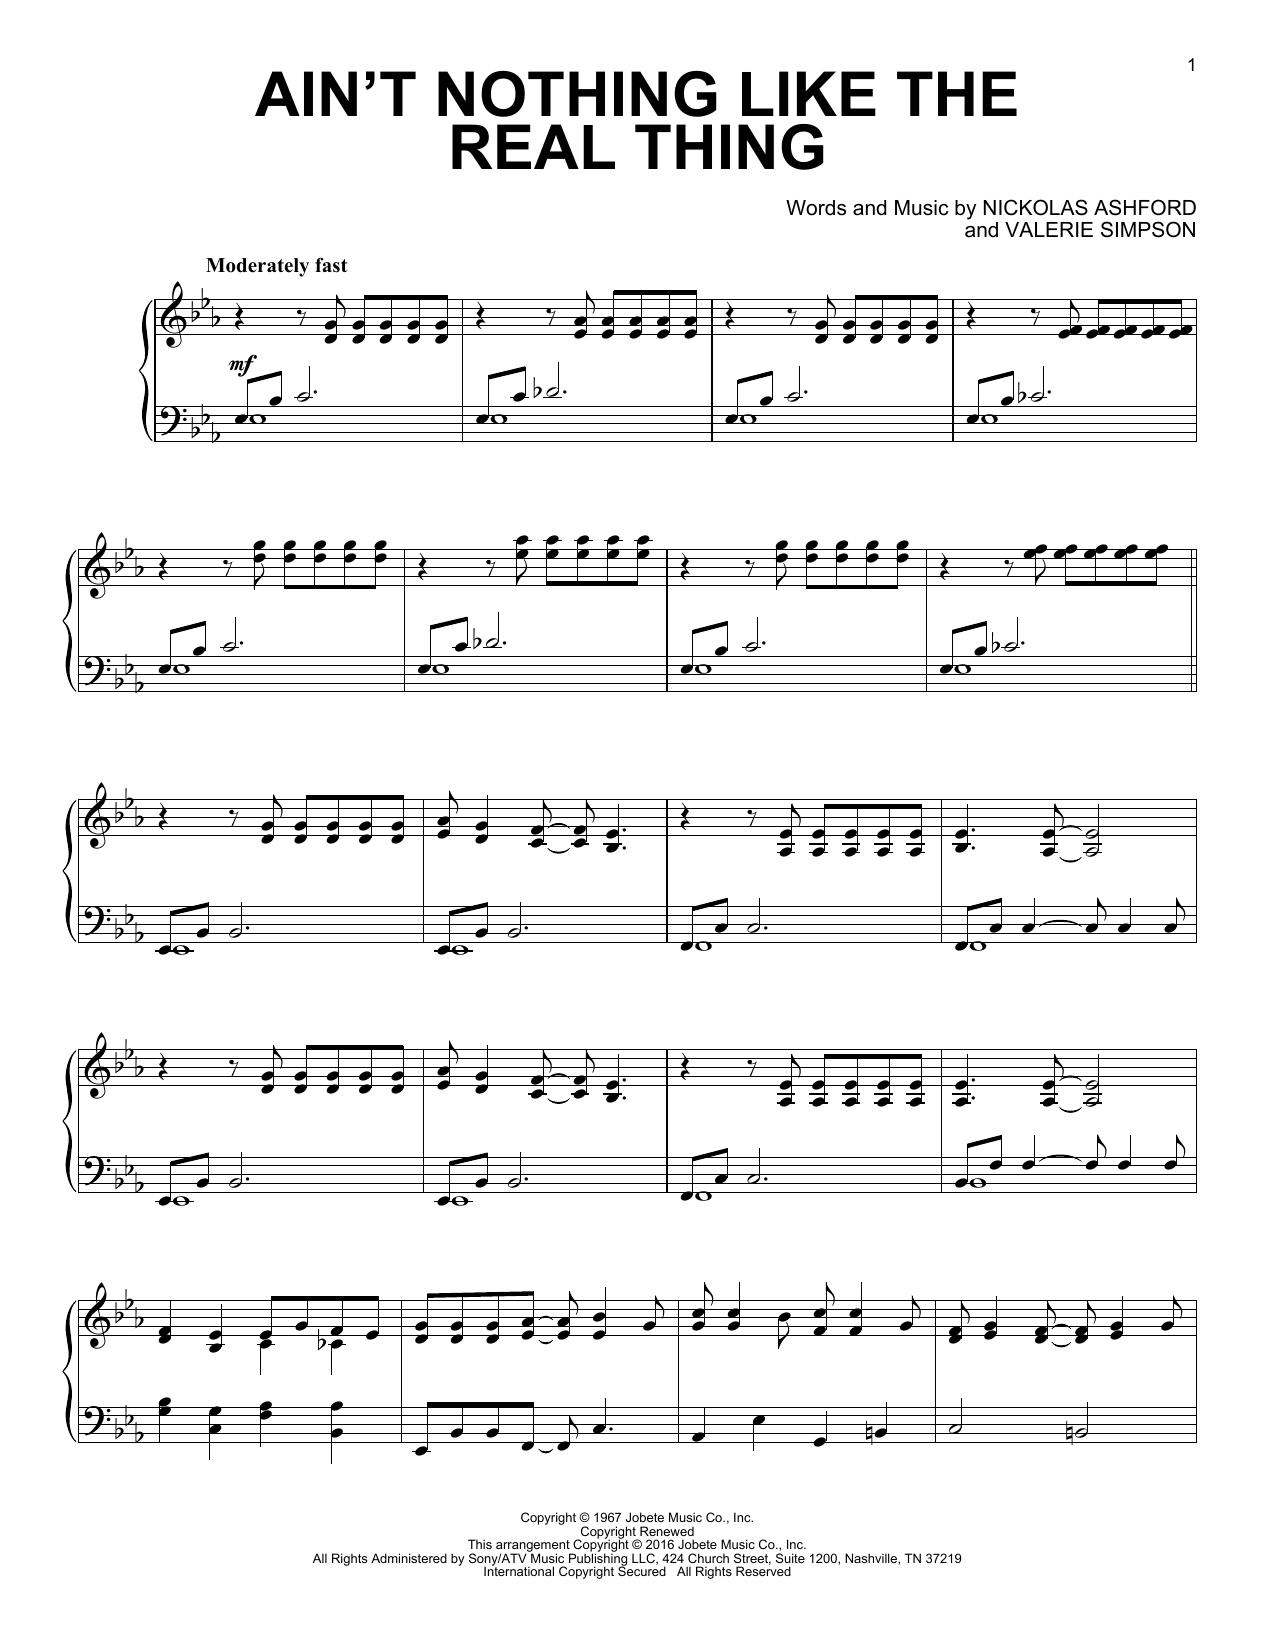 Nickolas Ashford Ain't Nothing Like The Real Thing [Jazz version] sheet music notes and chords. Download Printable PDF.